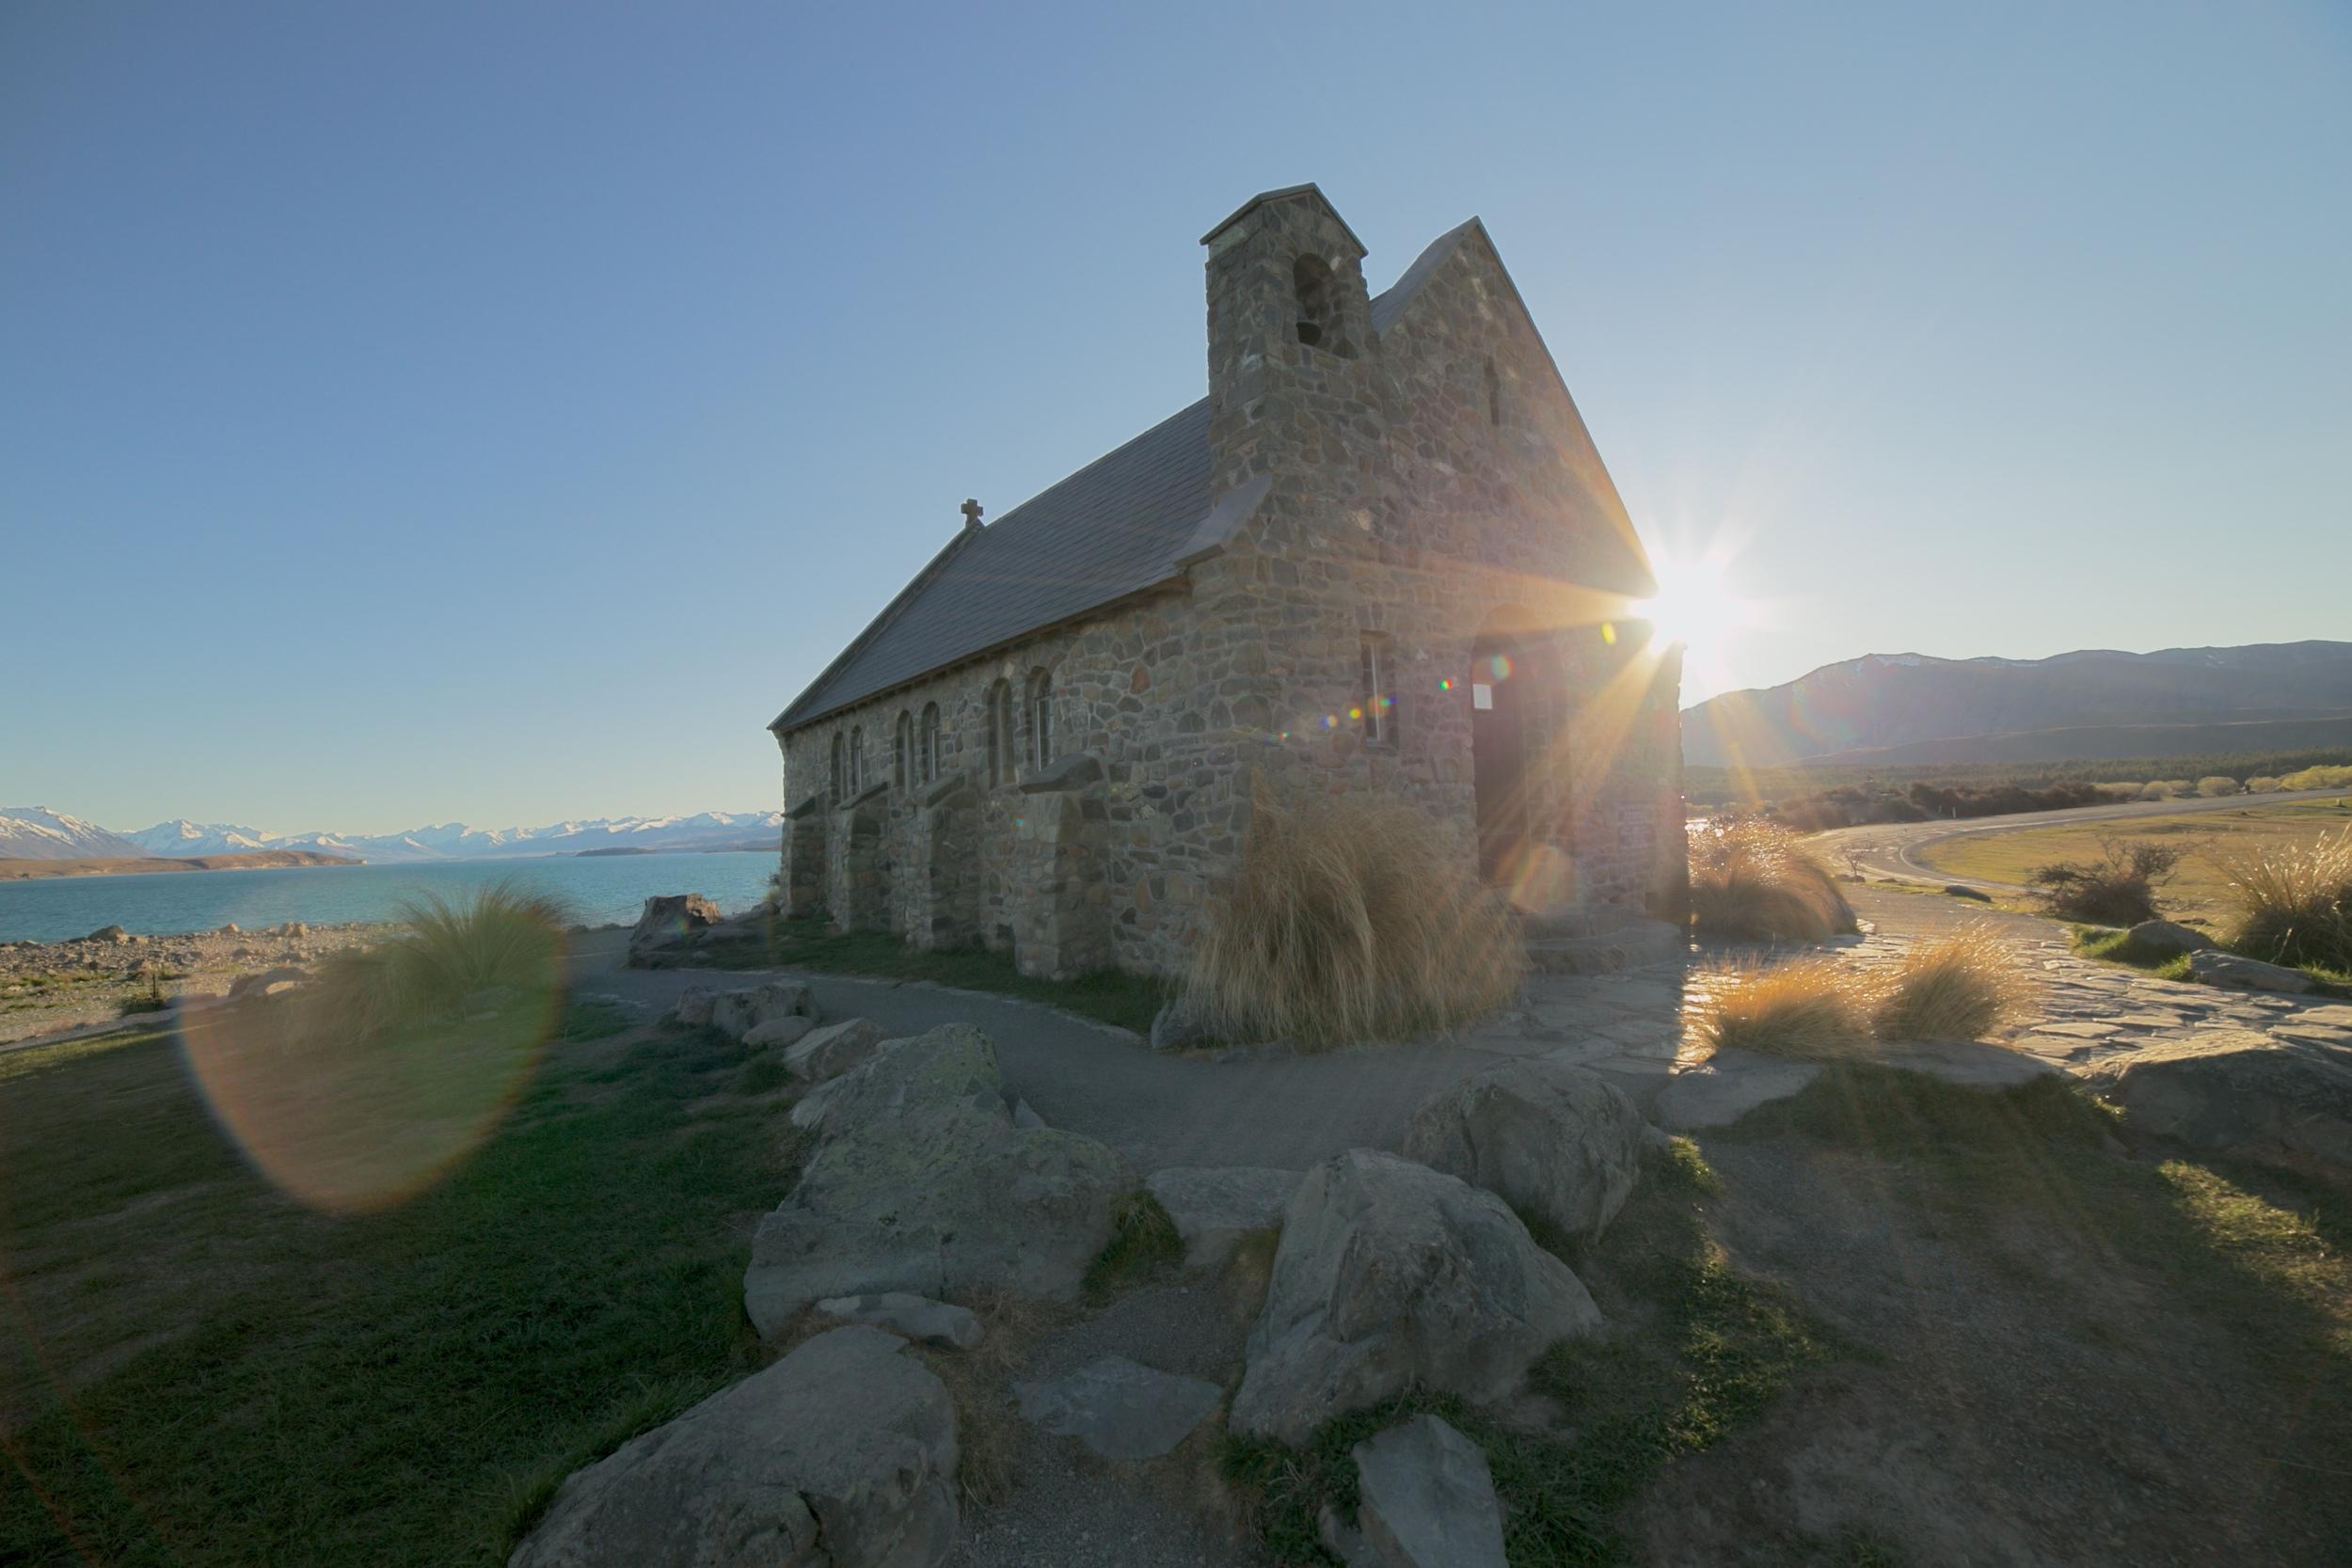 Sundown at the church of the Good Shepherd, Lake Tekapo, NZ.